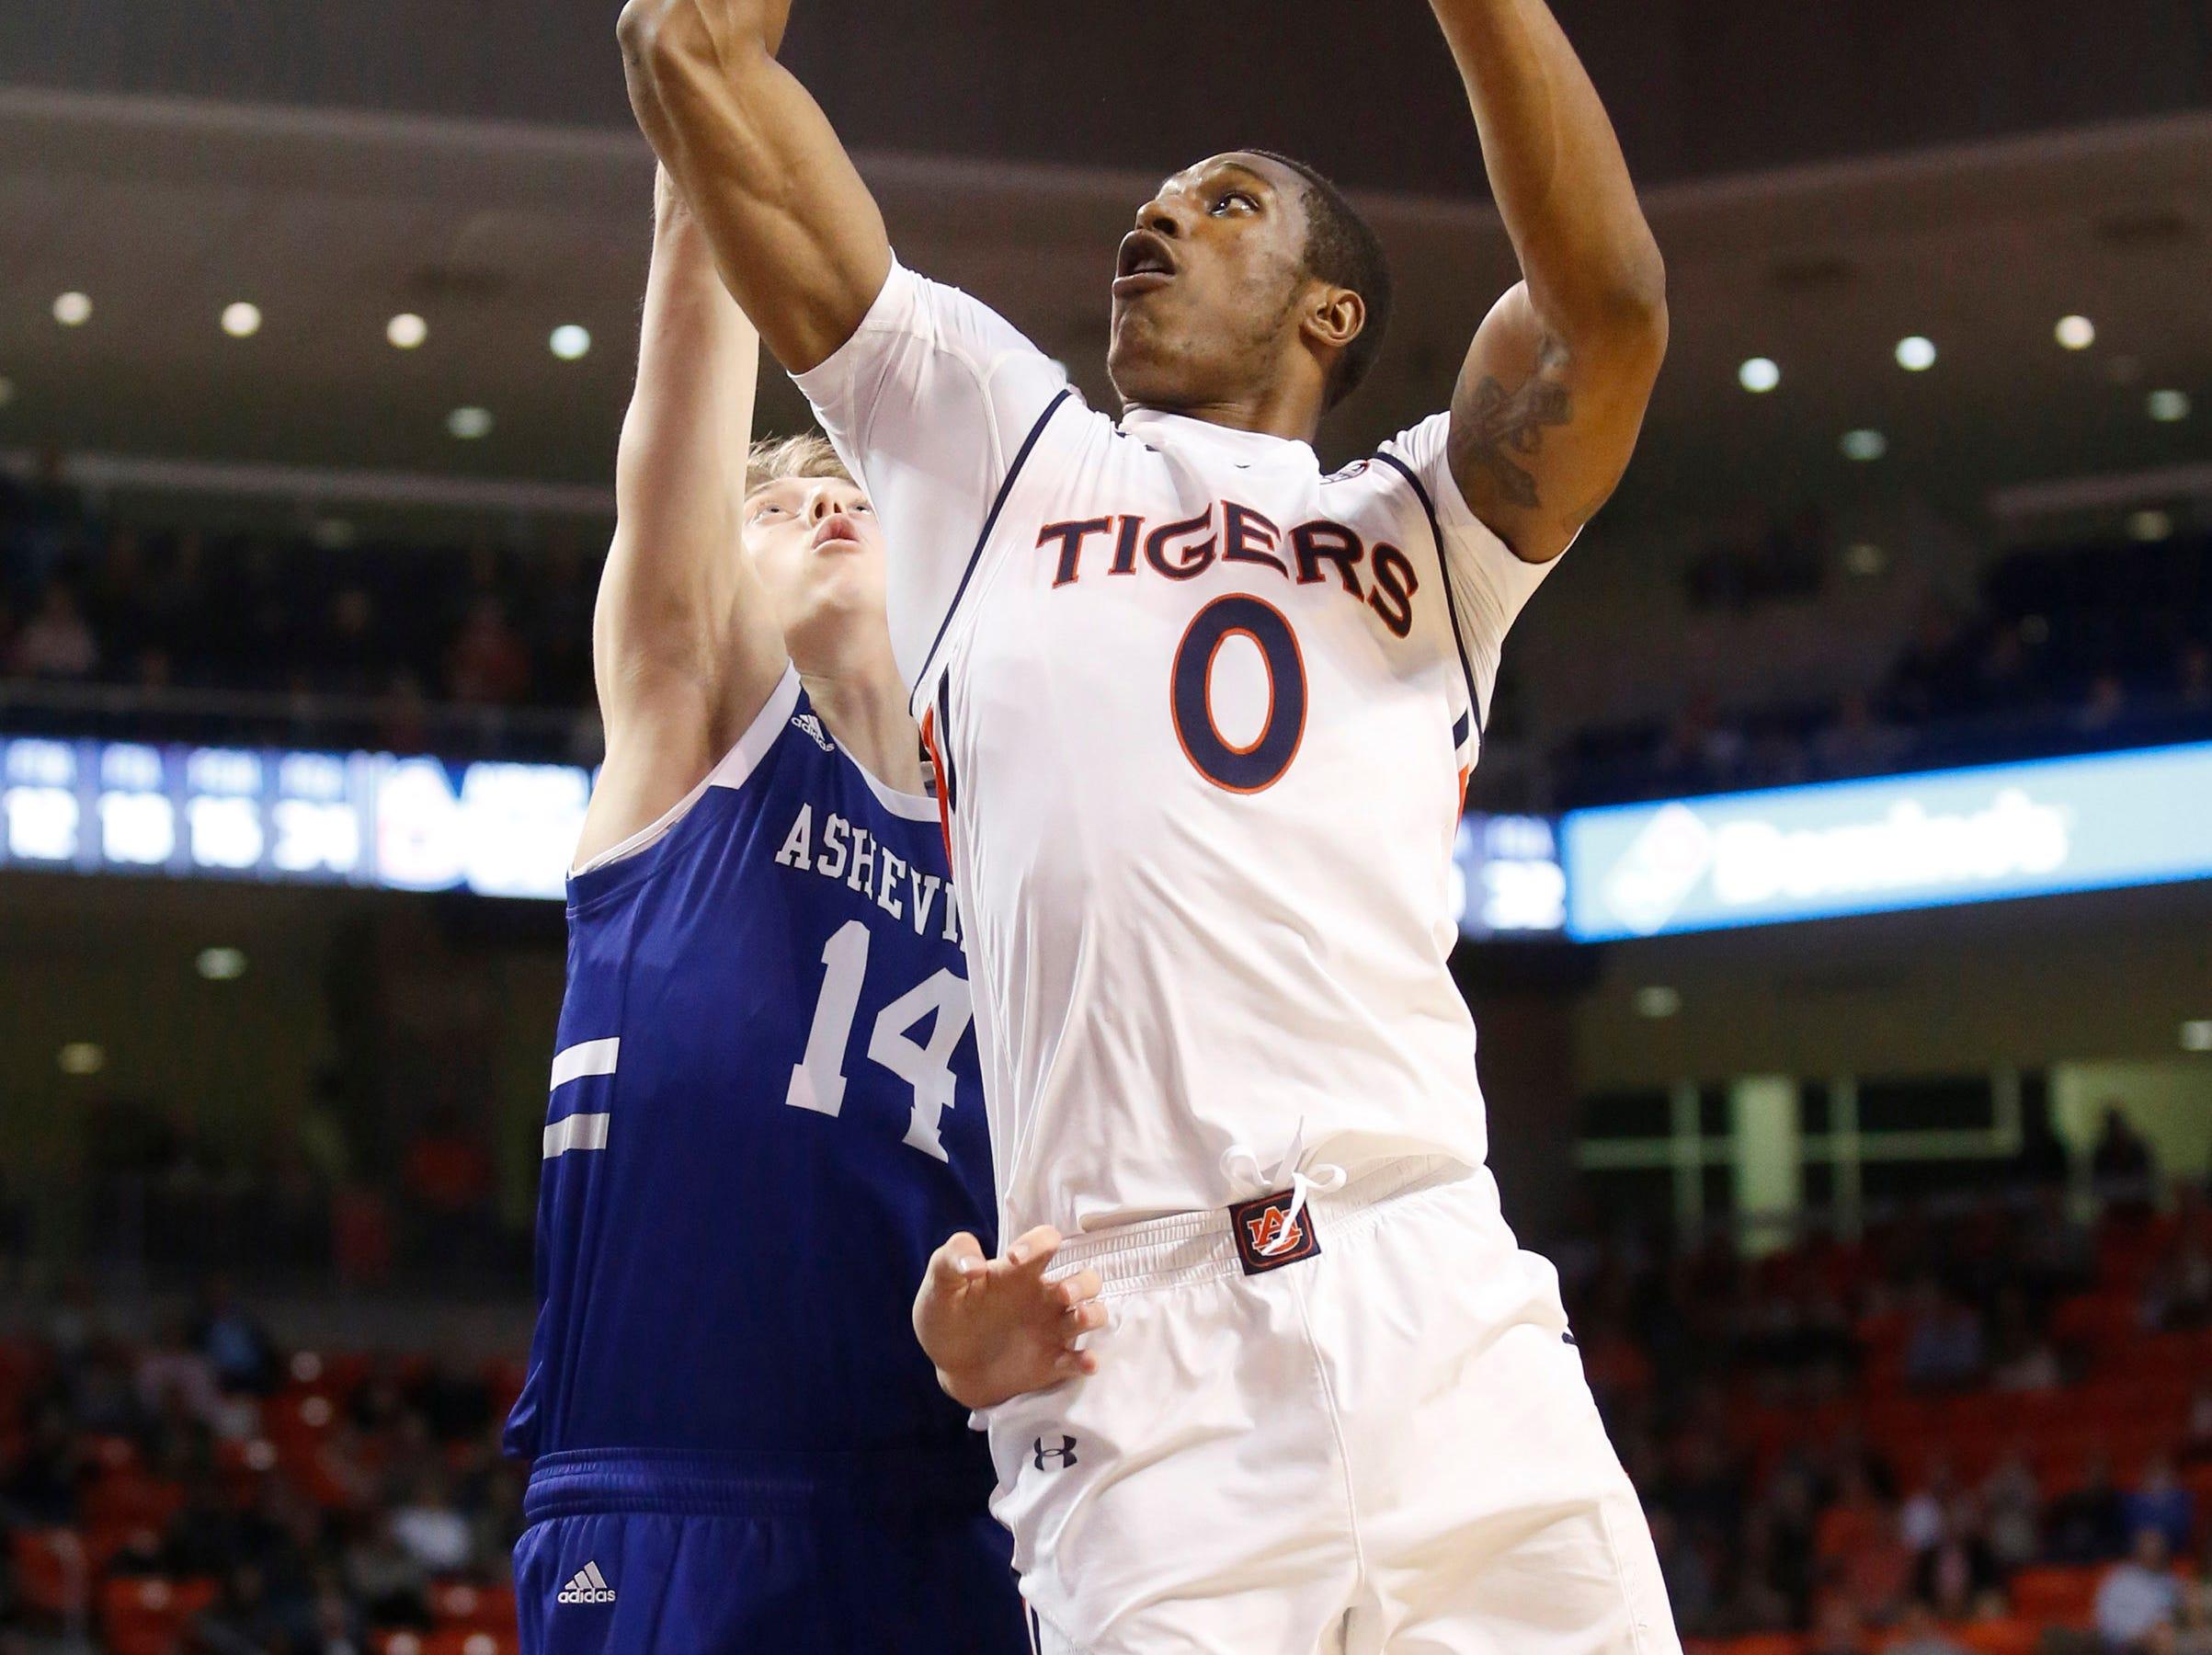 Dec 4, 2018; Auburn, AL, USA; Auburn Tigers forward Horace Spencer (0) shoots over UNC-Asheville Bulldogs forward Luke Lawson (14) during the second half at Auburn Arena. Mandatory Credit: John Reed-USA TODAY Sports